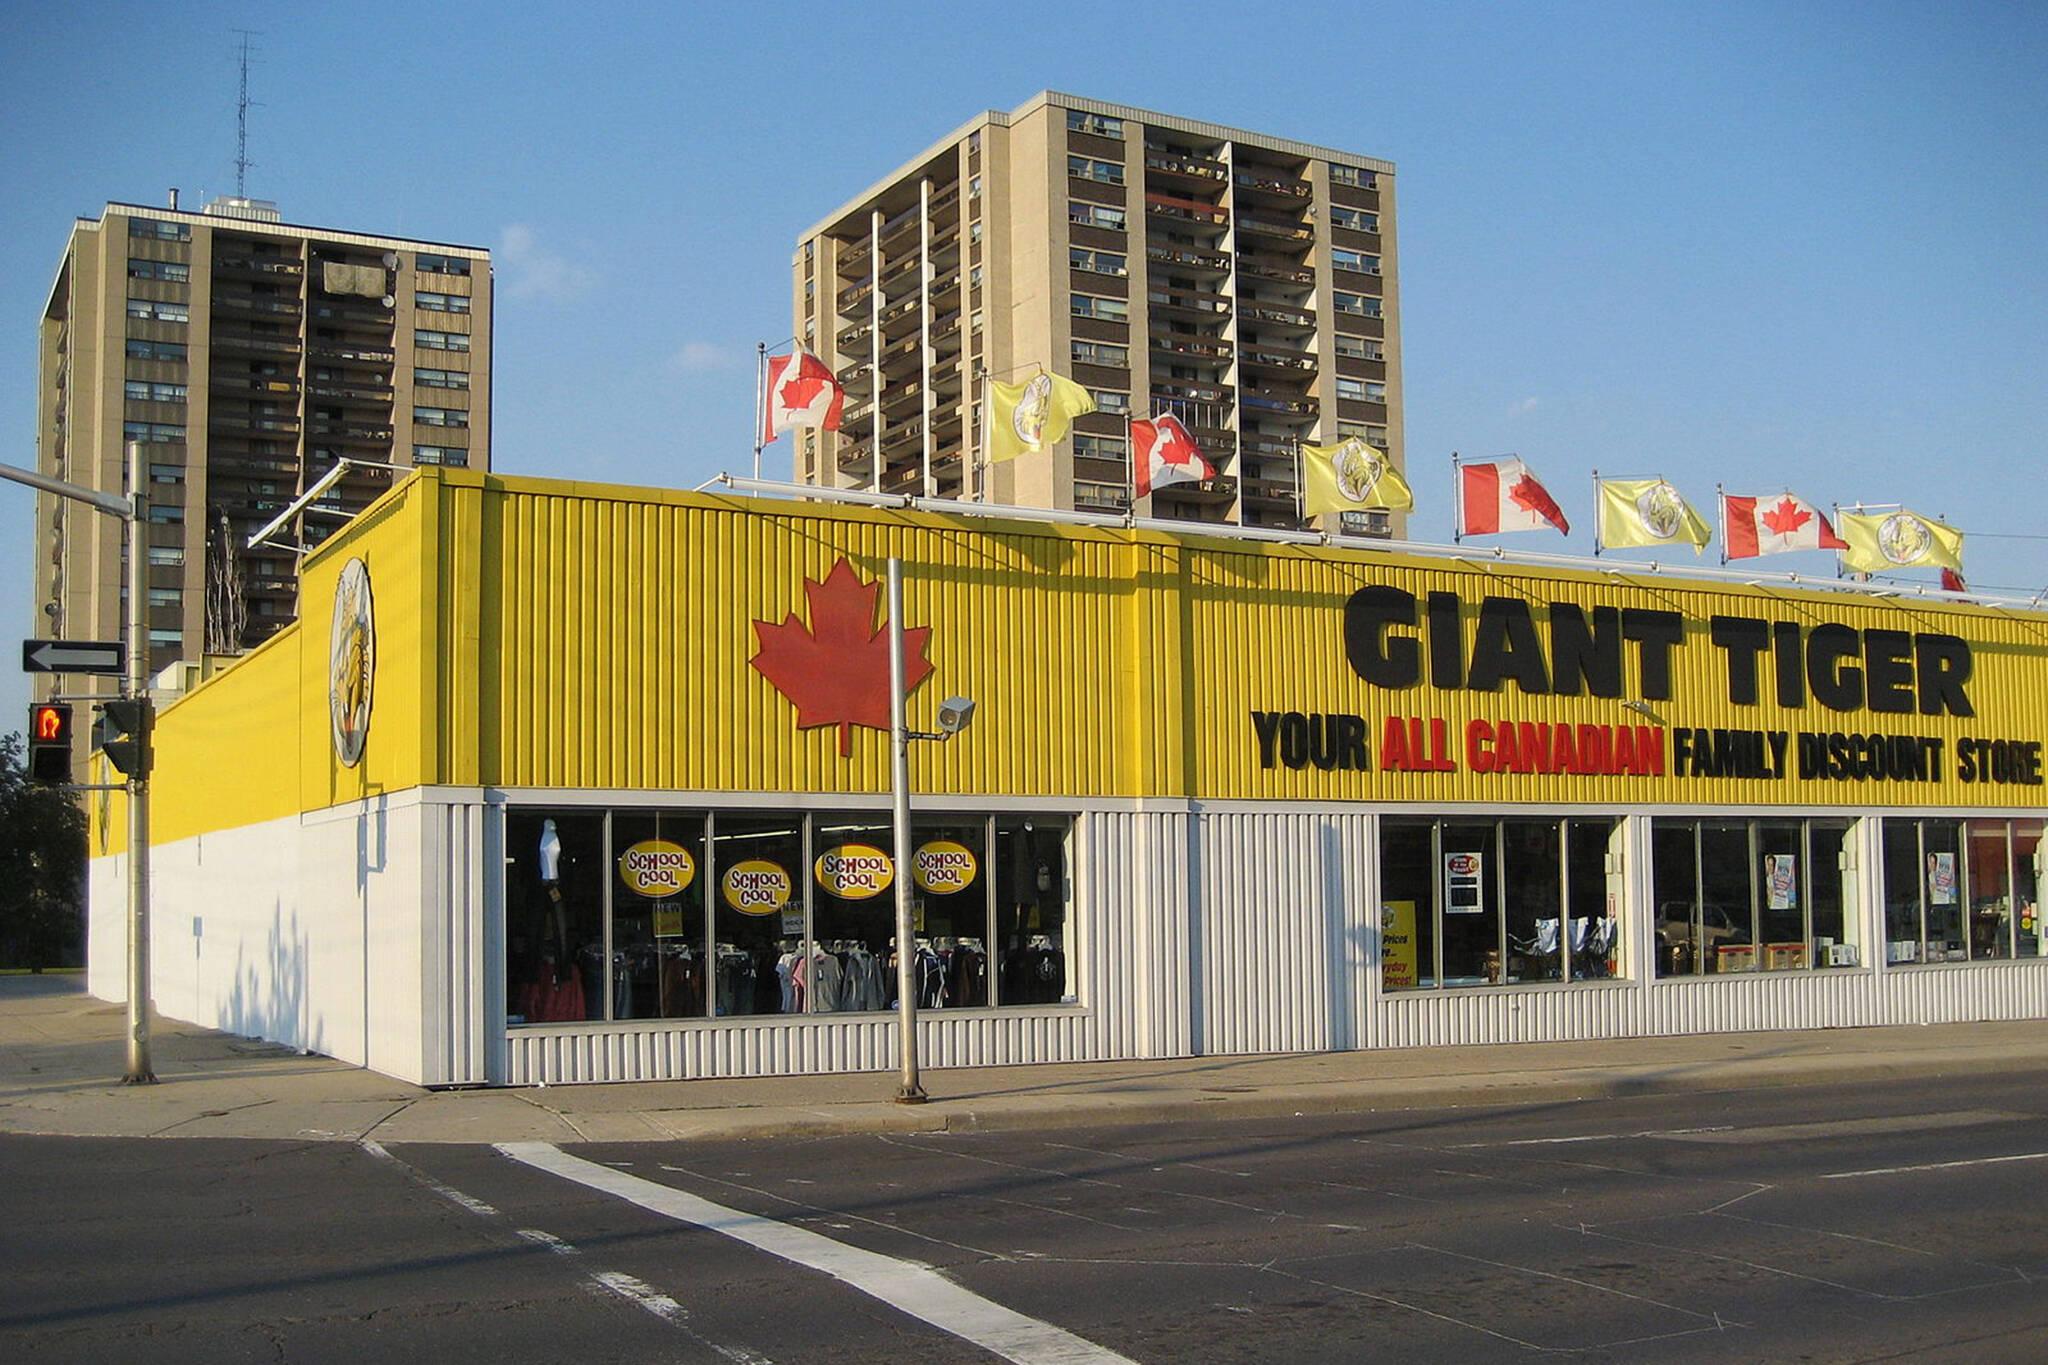 giant tiger expansion